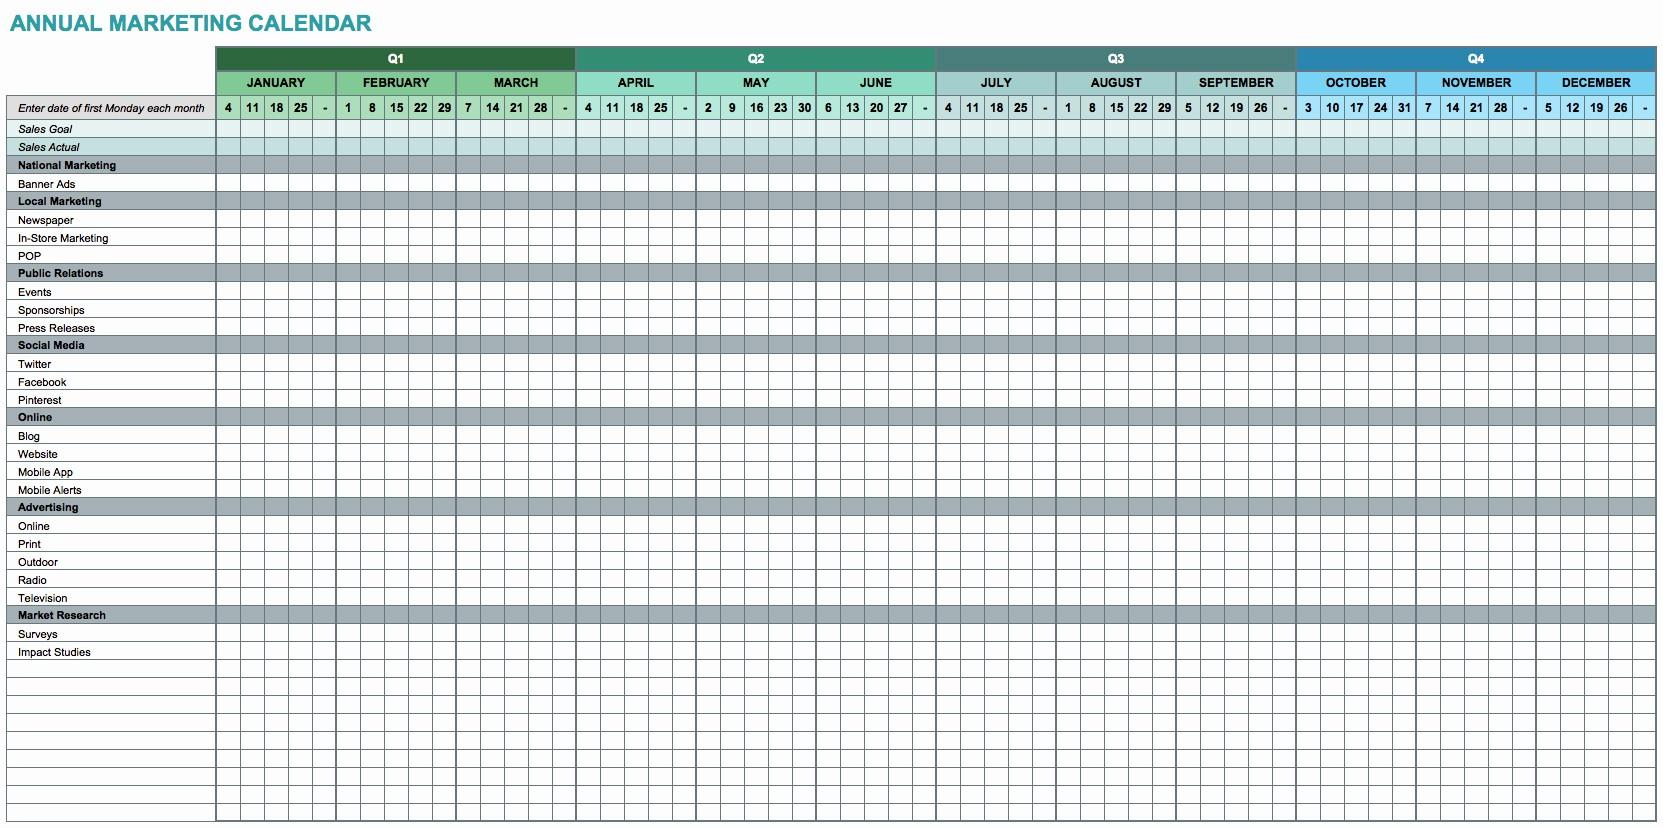 Marketing Calendar Template Excel 2015 Beautiful Marketing Calendar Excel Template 2015